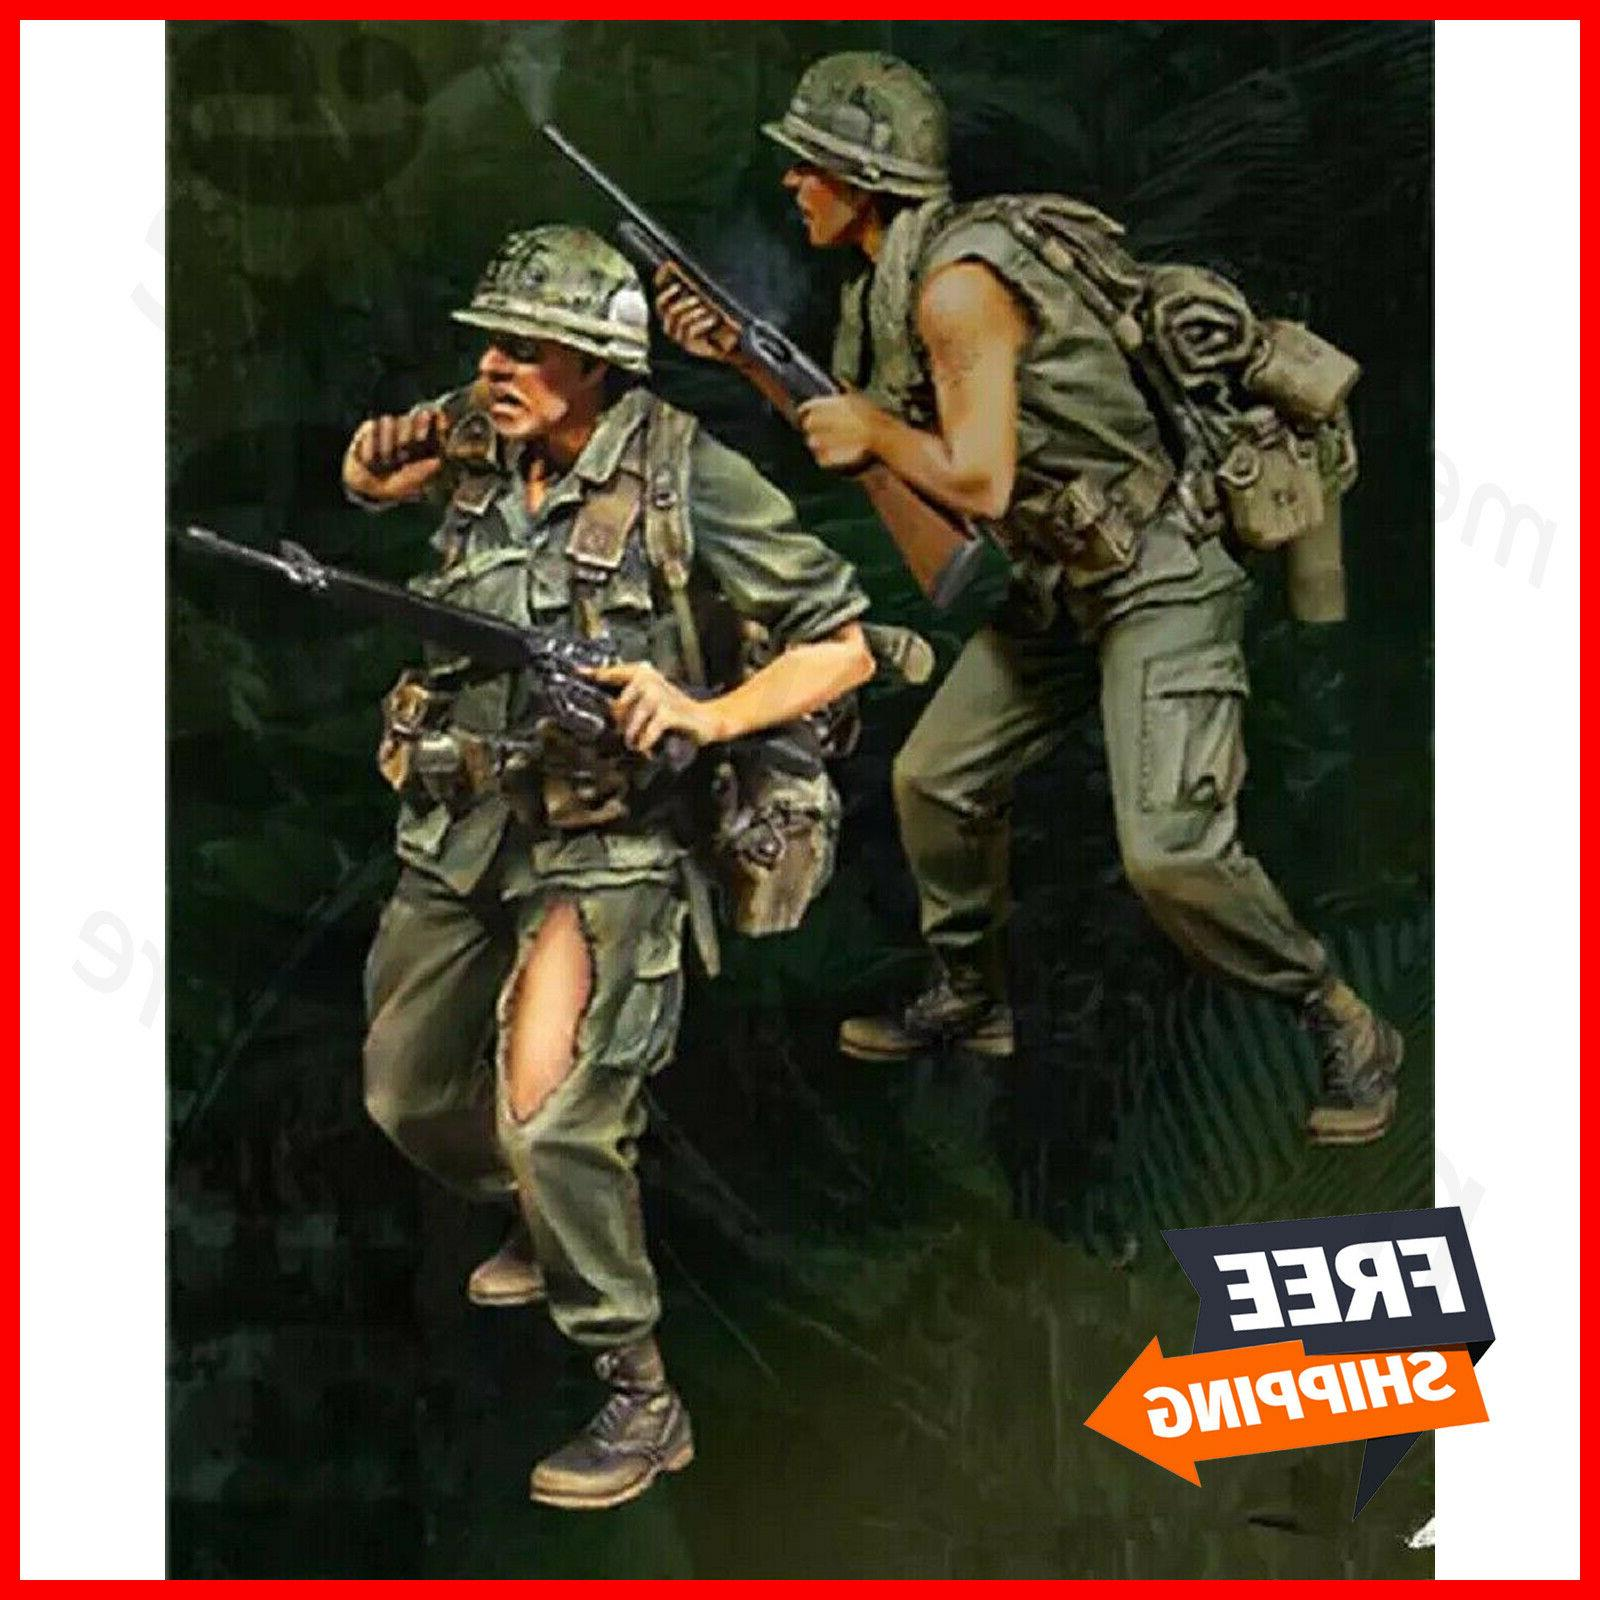 1/35 Resin Figure Model Kit Vietnam War US Soliers Unpainted